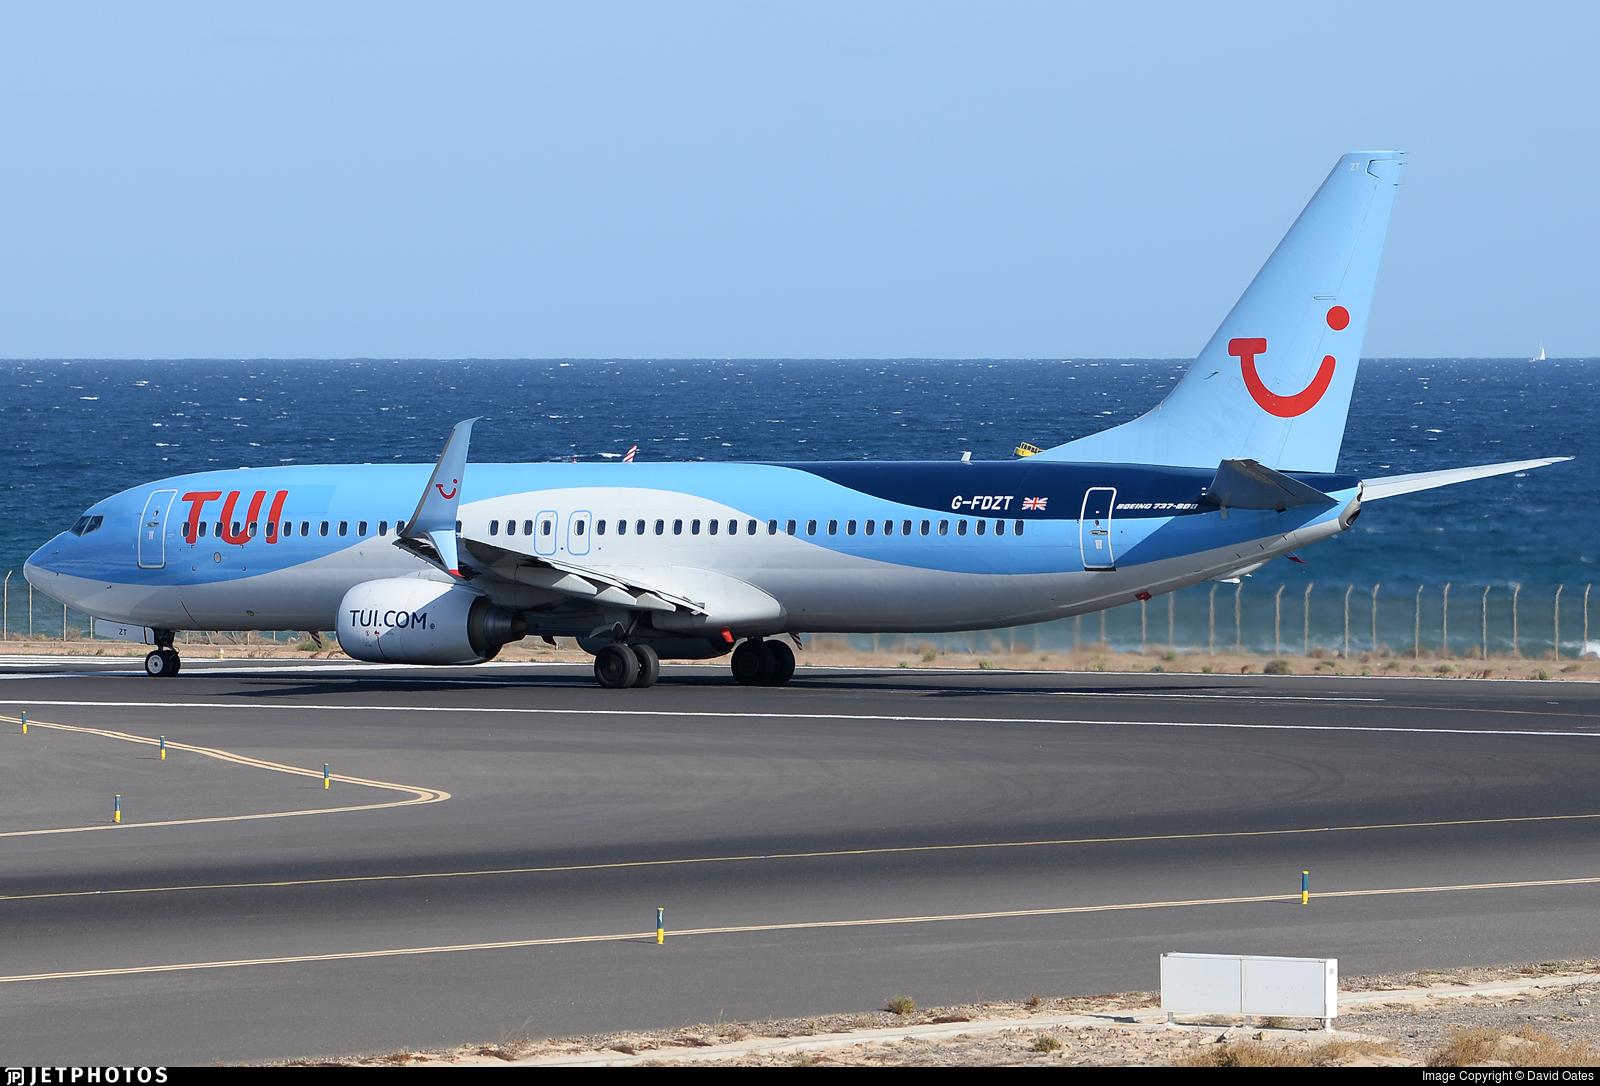 G-FDZT - Boeing 737-8K5 - TUI